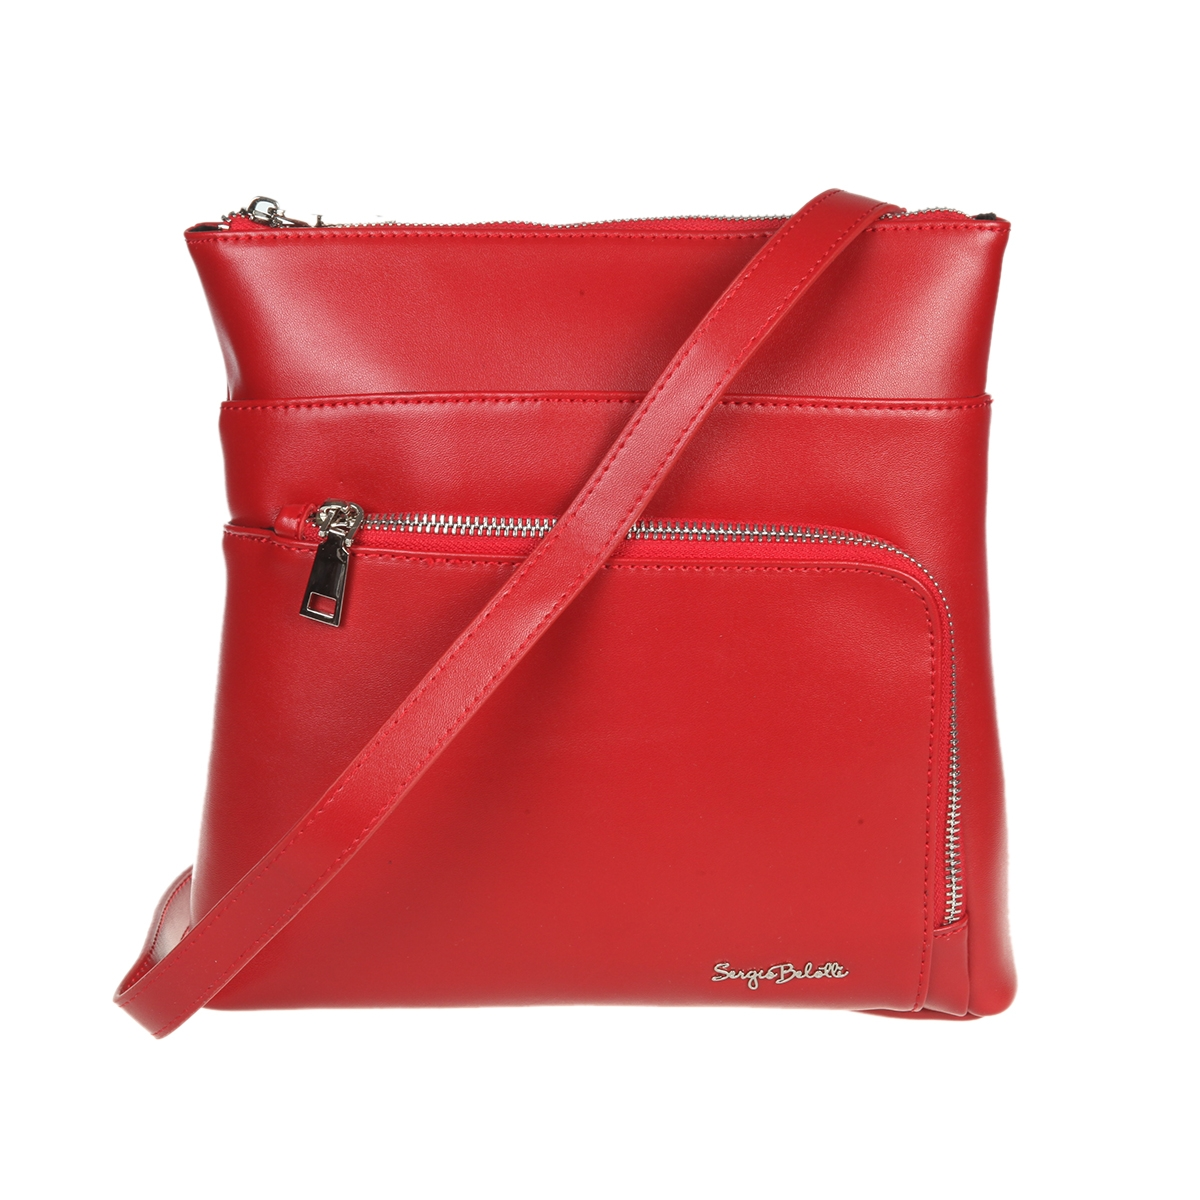 43560d4c37c3 Сумка Sergio Belotti 648 red, 25.5x25 см, натуральная кожа, цвет ...